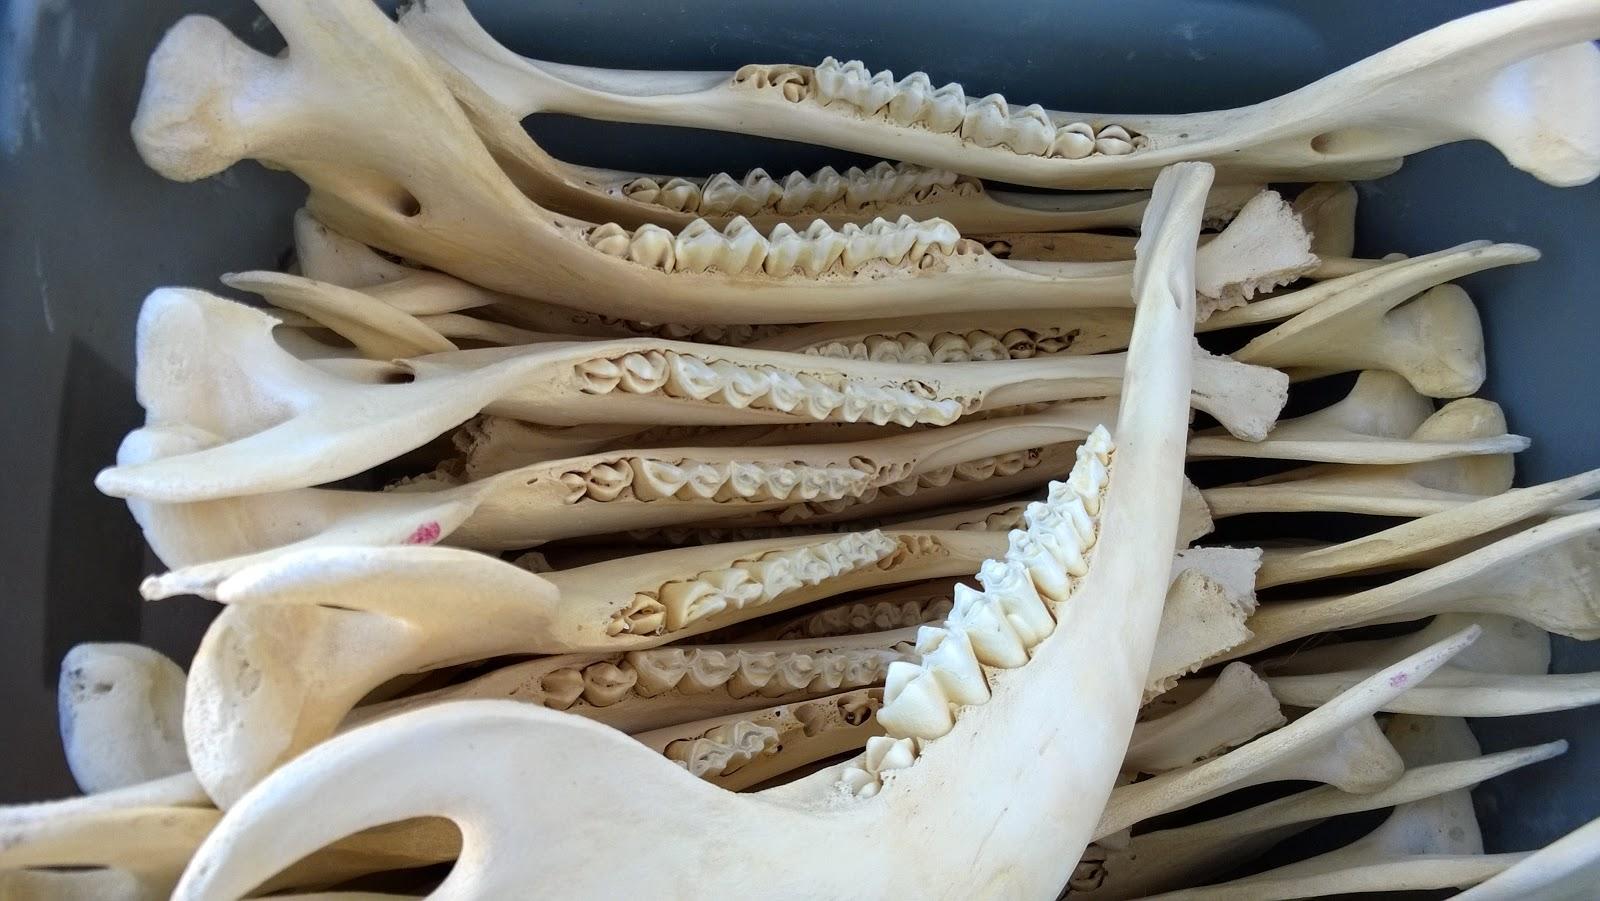 cattle jaw bones